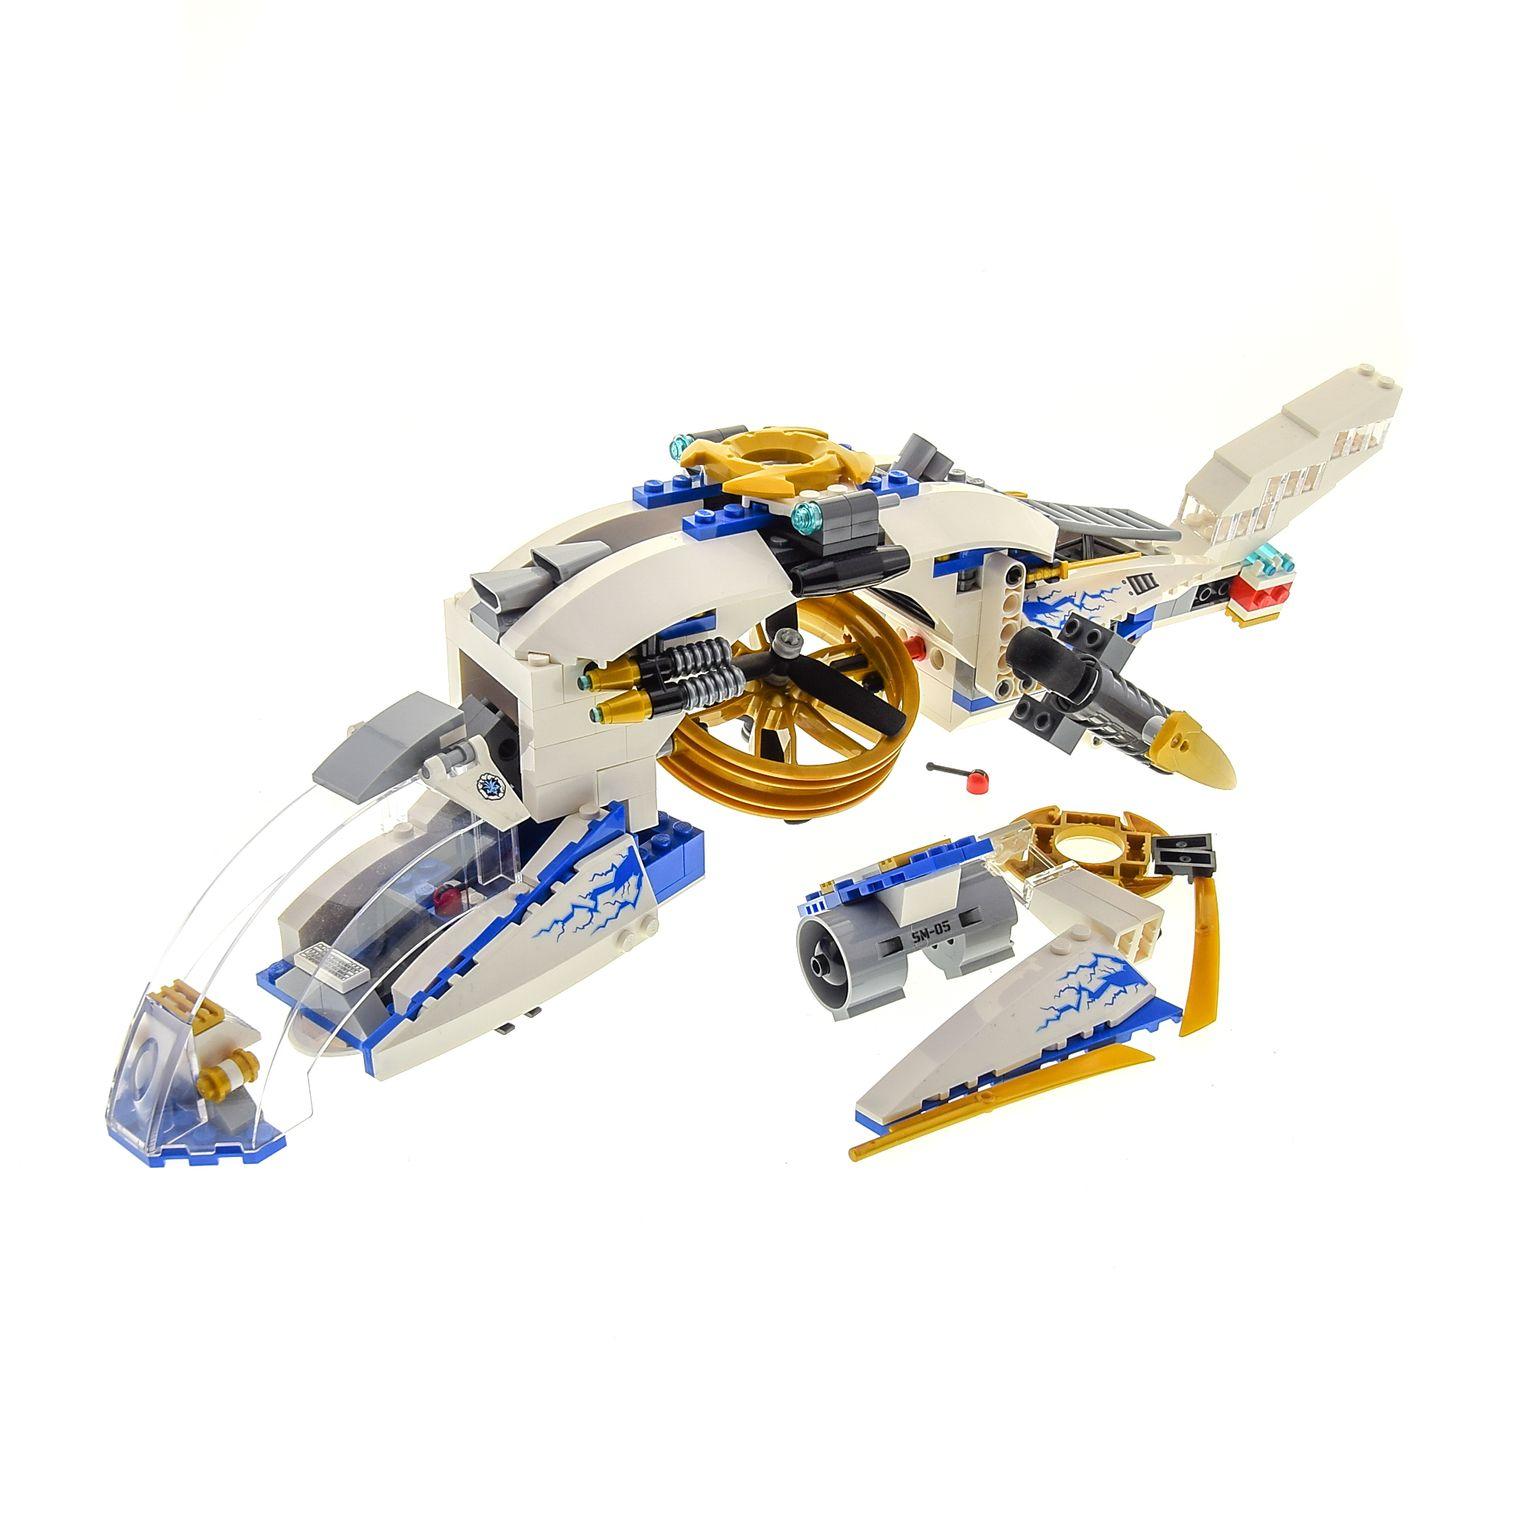 1 X Lego Brick Instructions Ninjago Rebooted Ninjacopter 70724